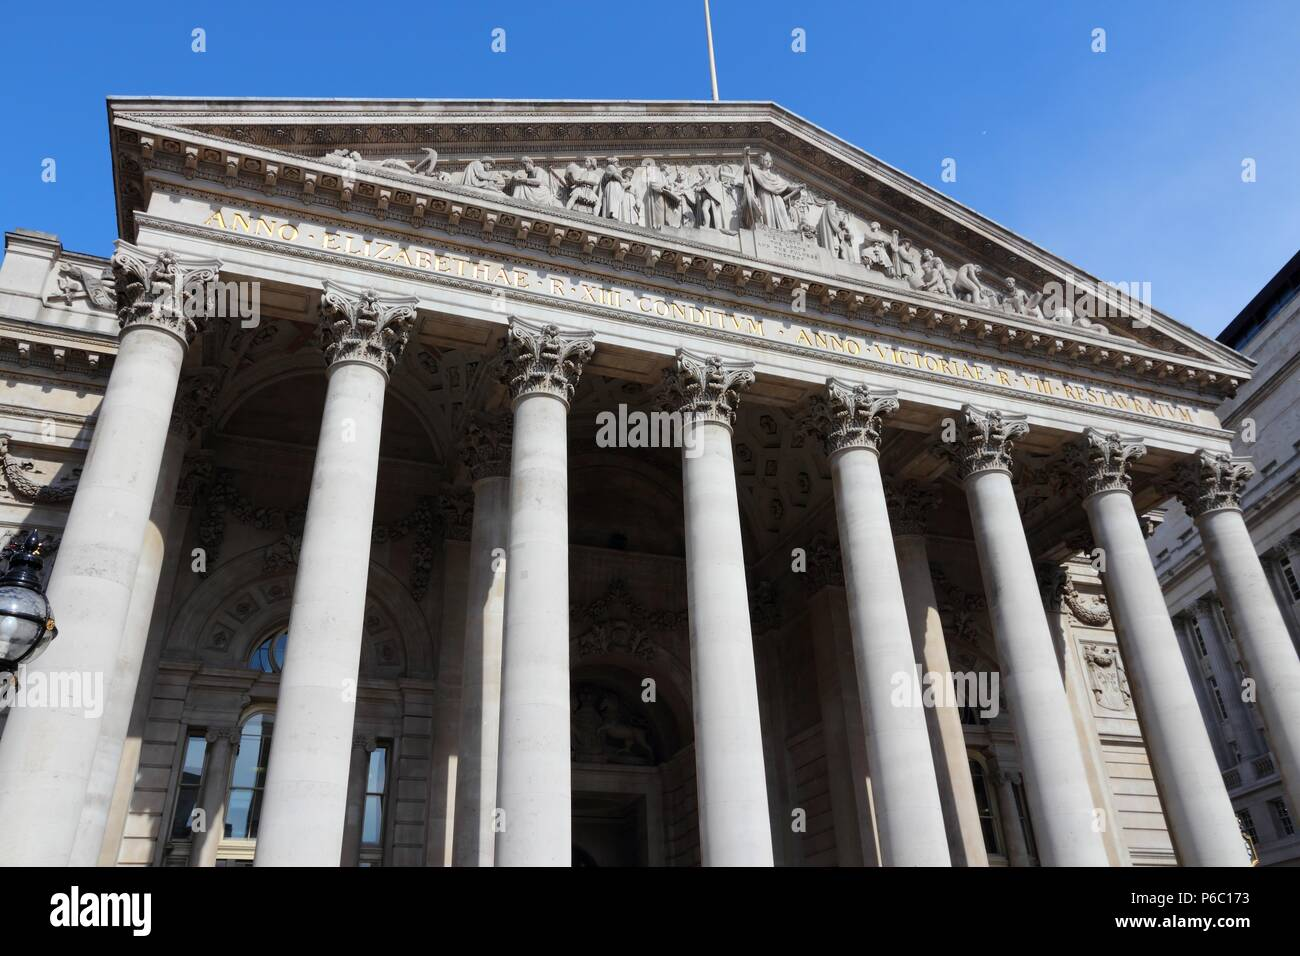 London, United Kingdom - Royal Exchange building at Bank junction. - Stock Image